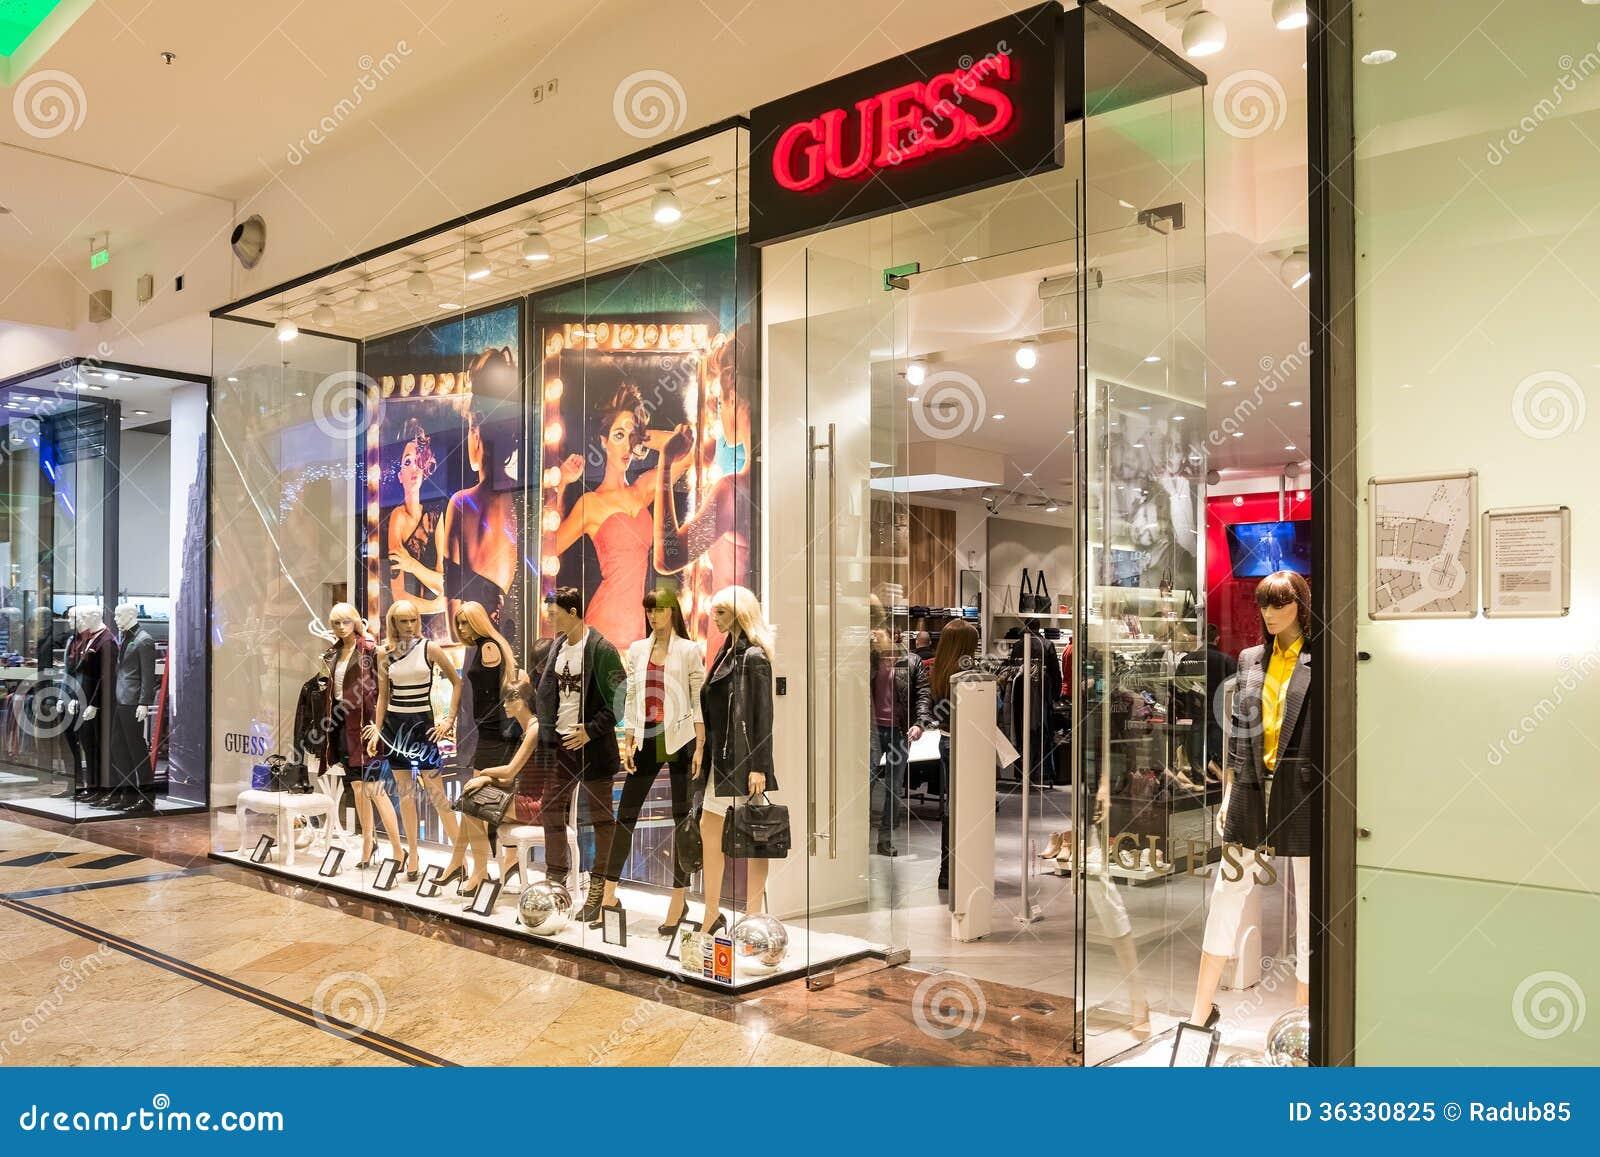 Michael Kors Handbag Fashion Store Editorial Stock Photo - Image